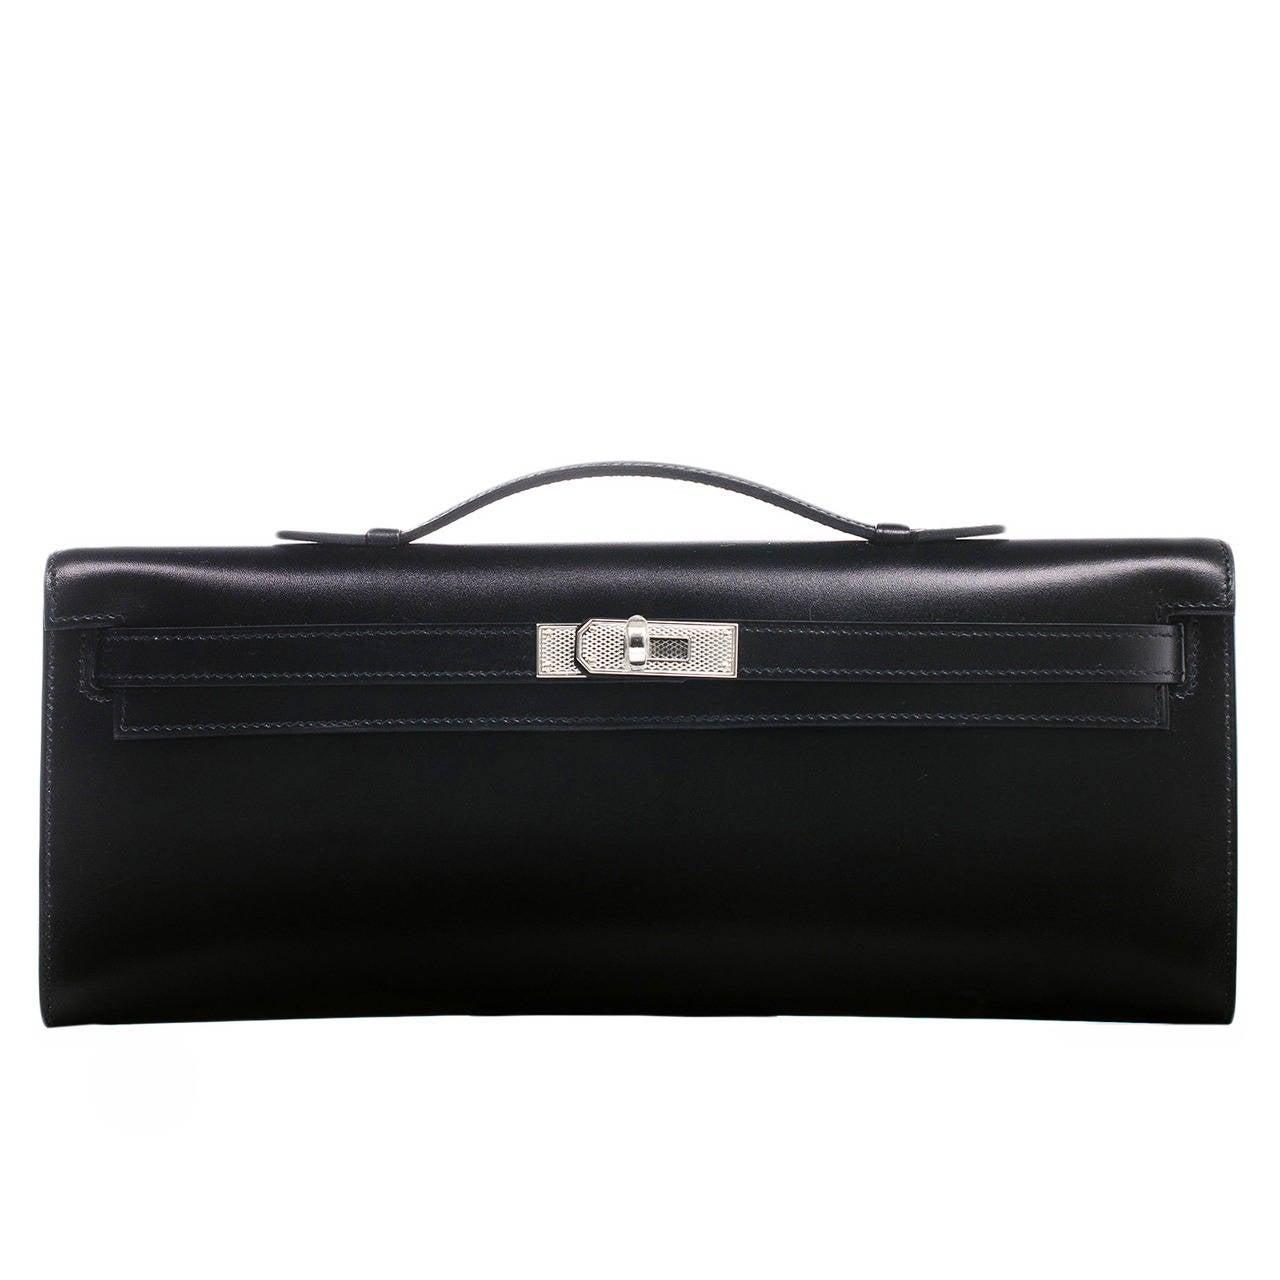 hermes bags for sale - Hermes Black Box Kelly Cut Palladium Guilloche Hardware at 1stdibs